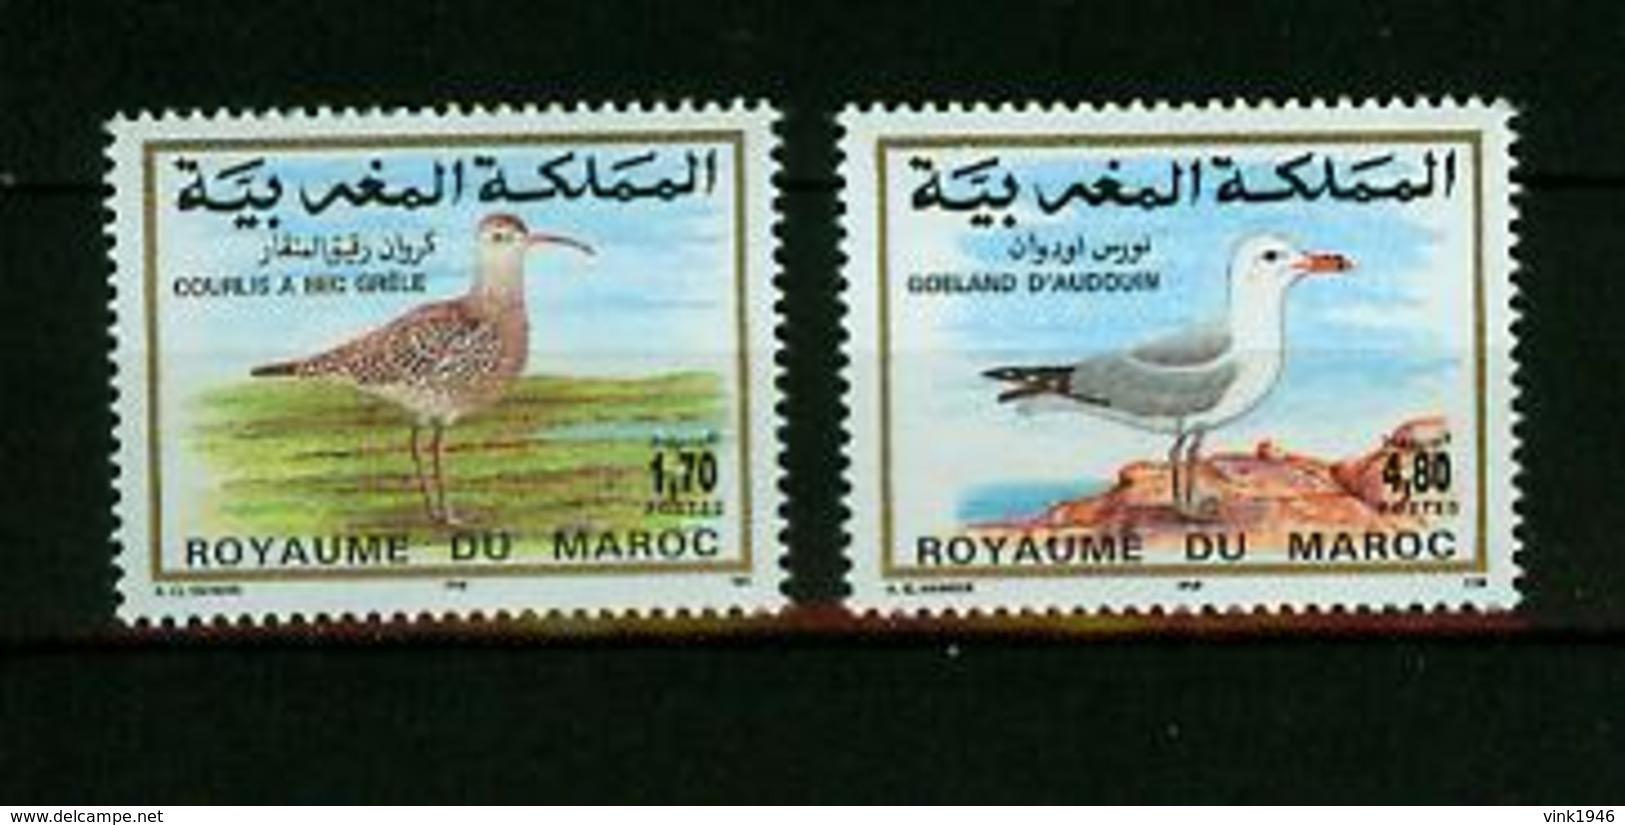 Maroc 1994,2V In Set ,birds,vogels,vögel,oiseaux,pajaros,uccelli,aves,MNH/Postfris(A3635) - Oiseaux